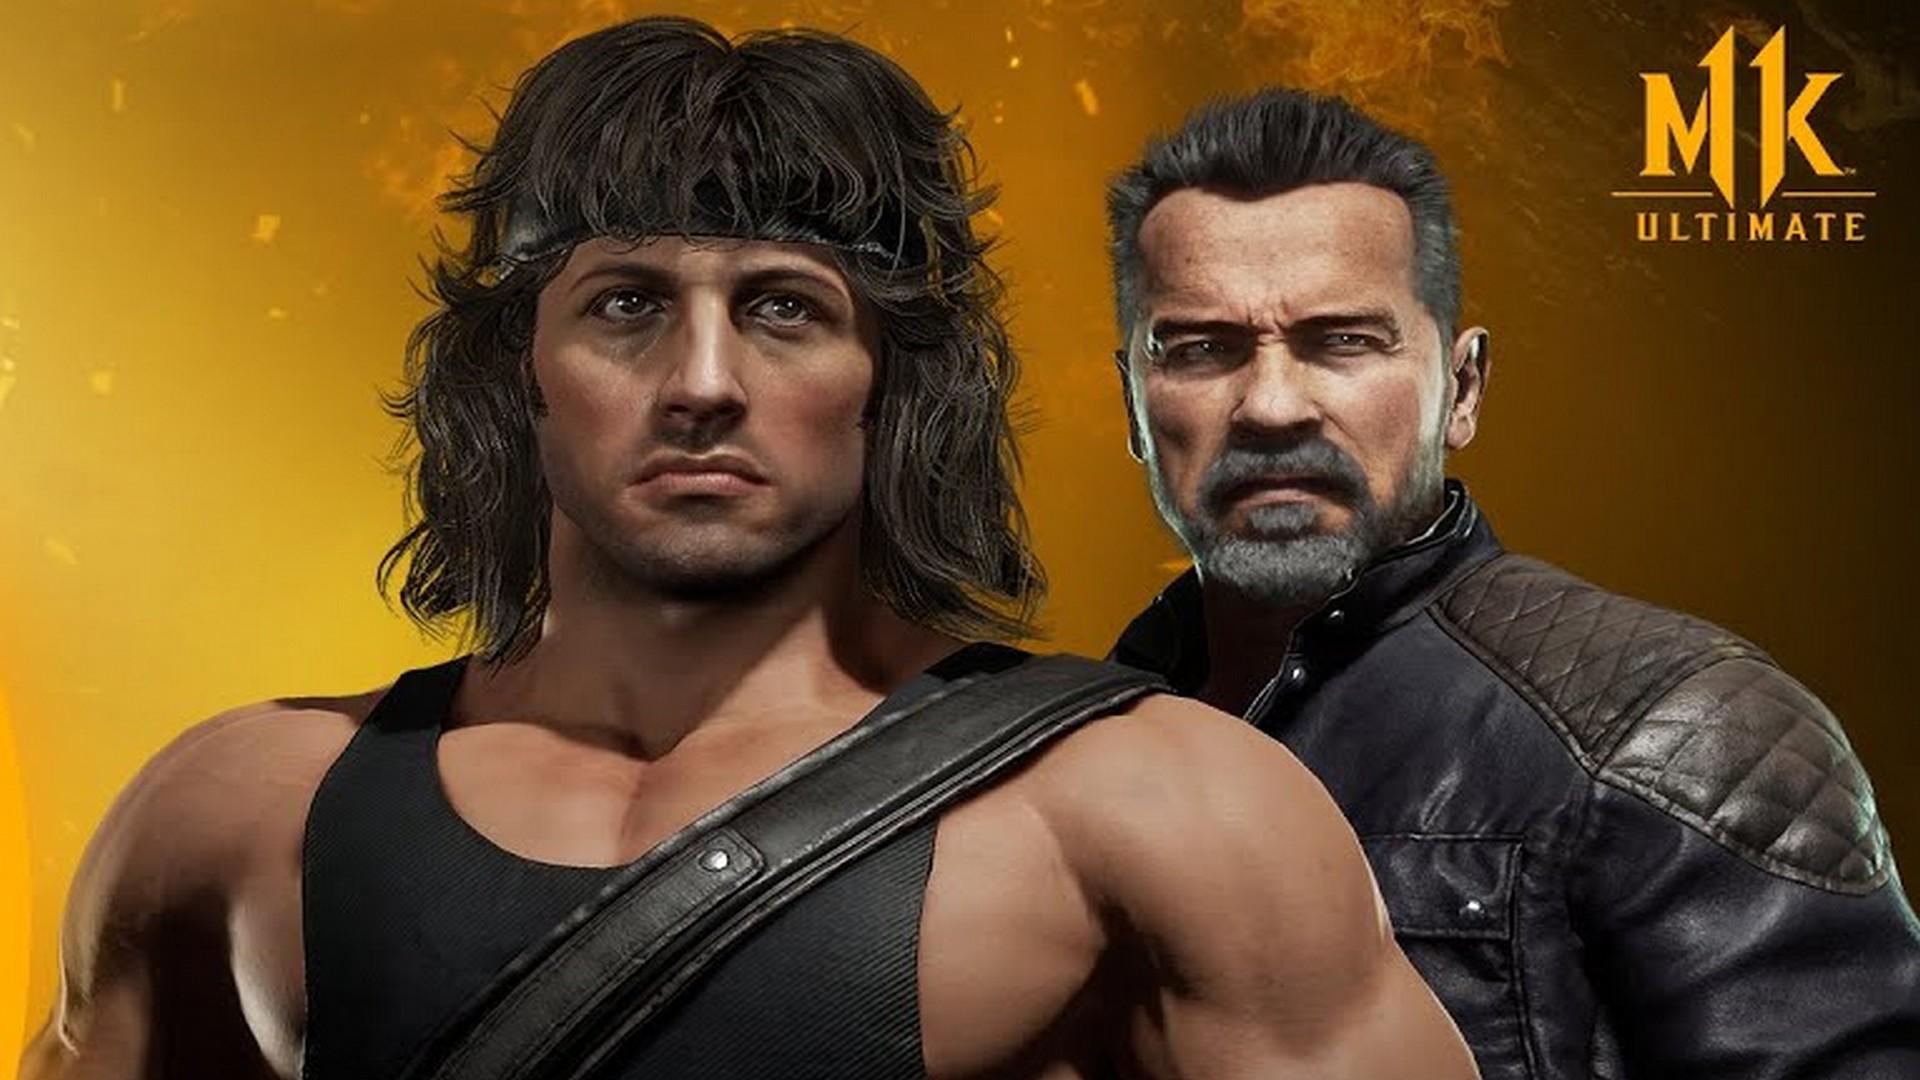 New Mortal Kombat 11 Ultimate Trailers Debut Marquee Matchup – Rambo vs. Terminator